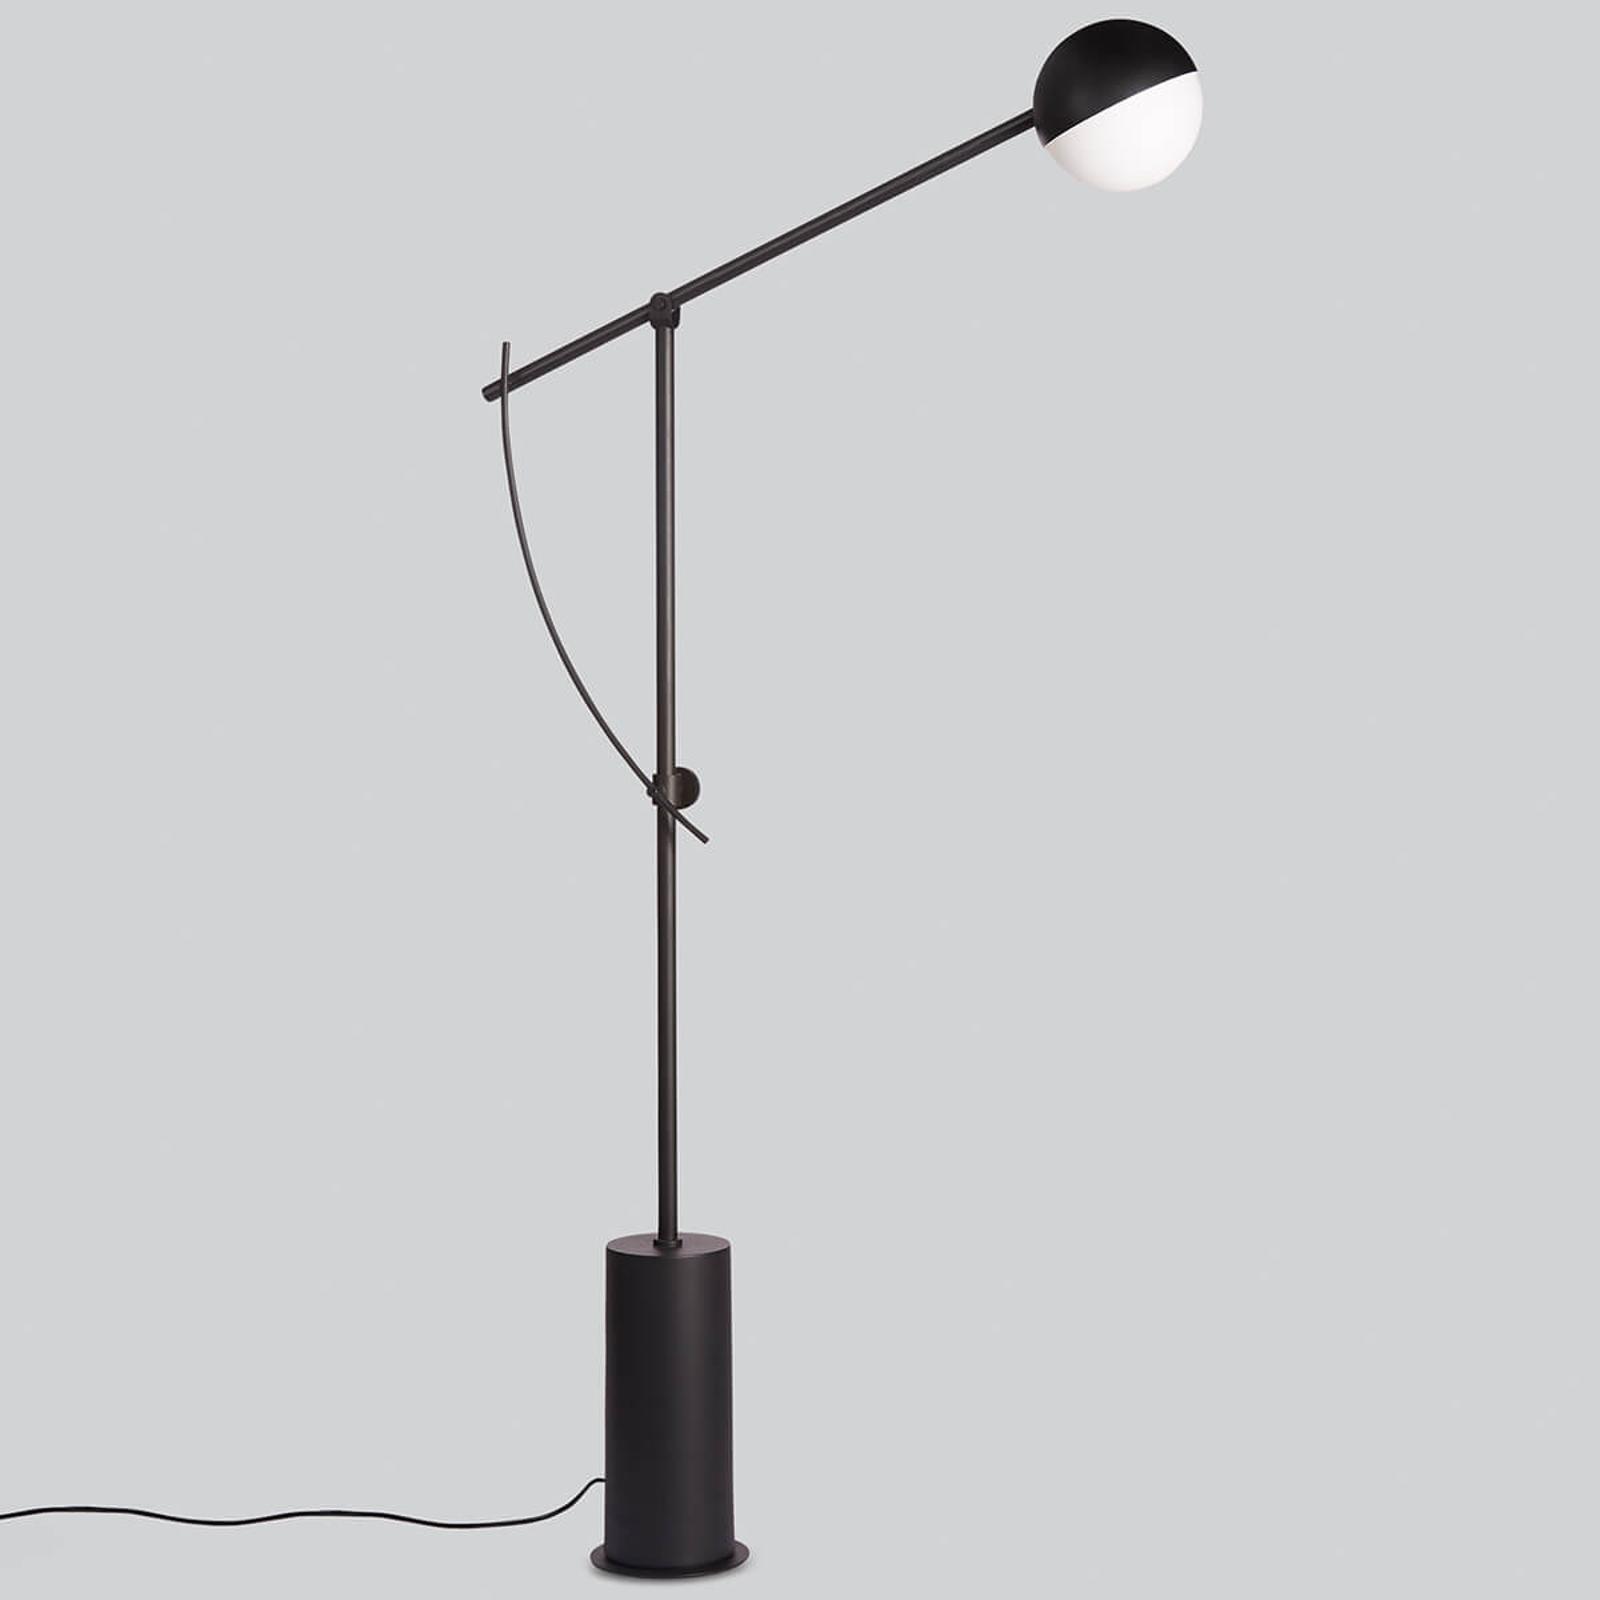 Design vloerlamp Balancer